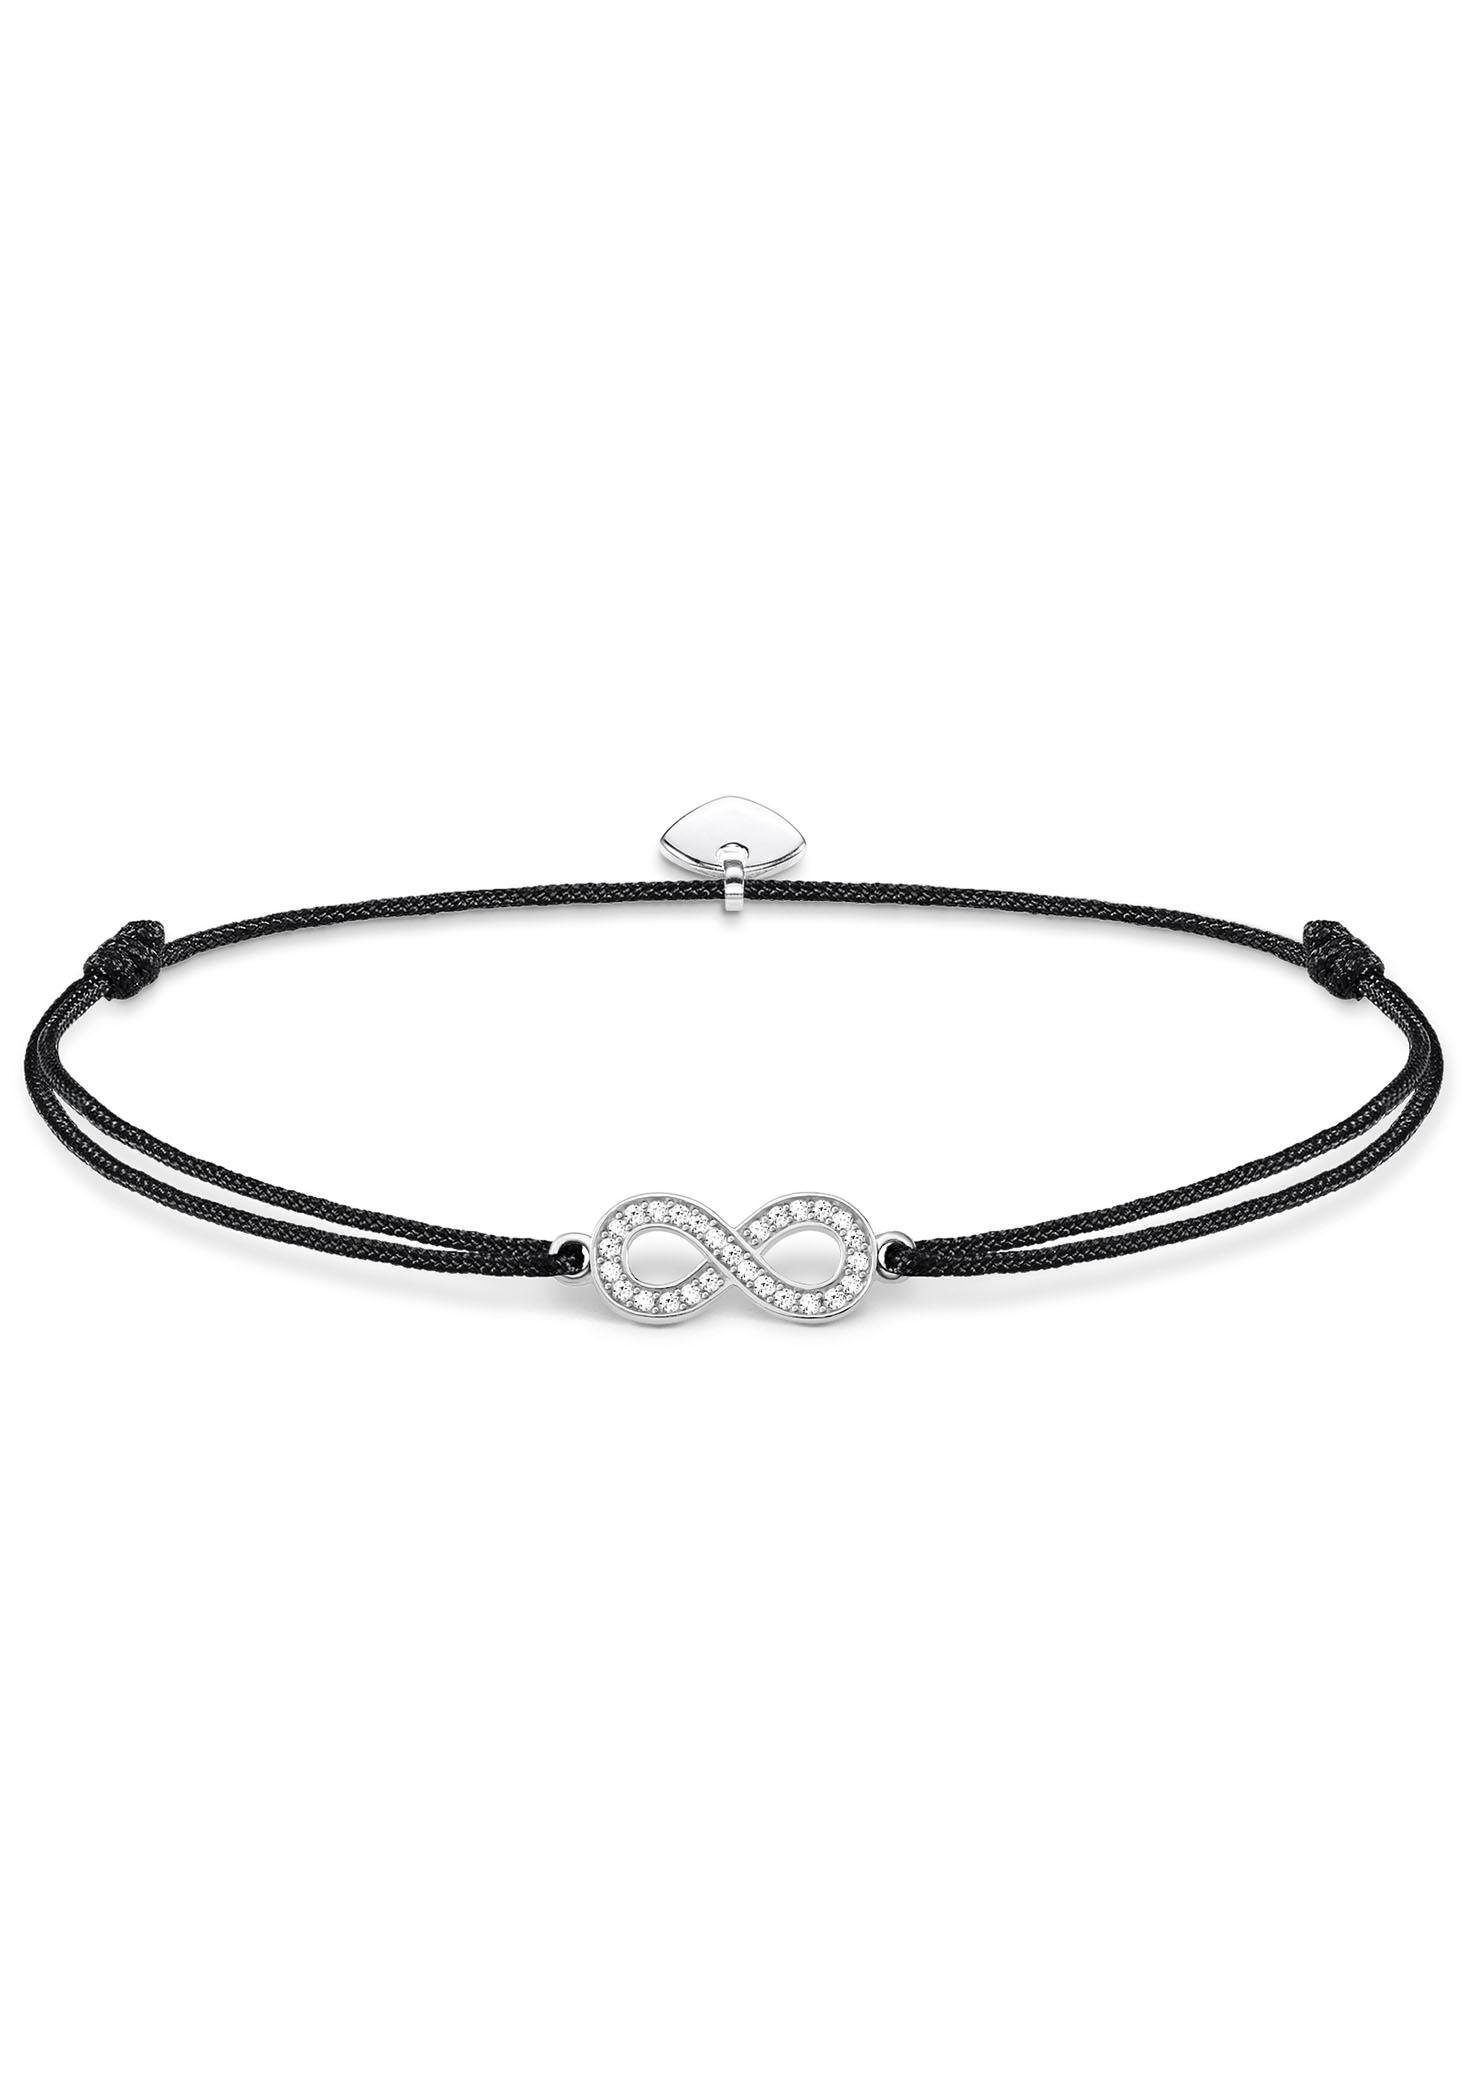 THOMAS SABO Armband »Infinity, Little Secret, LS003-401-11-L20v« mit Zirkonia